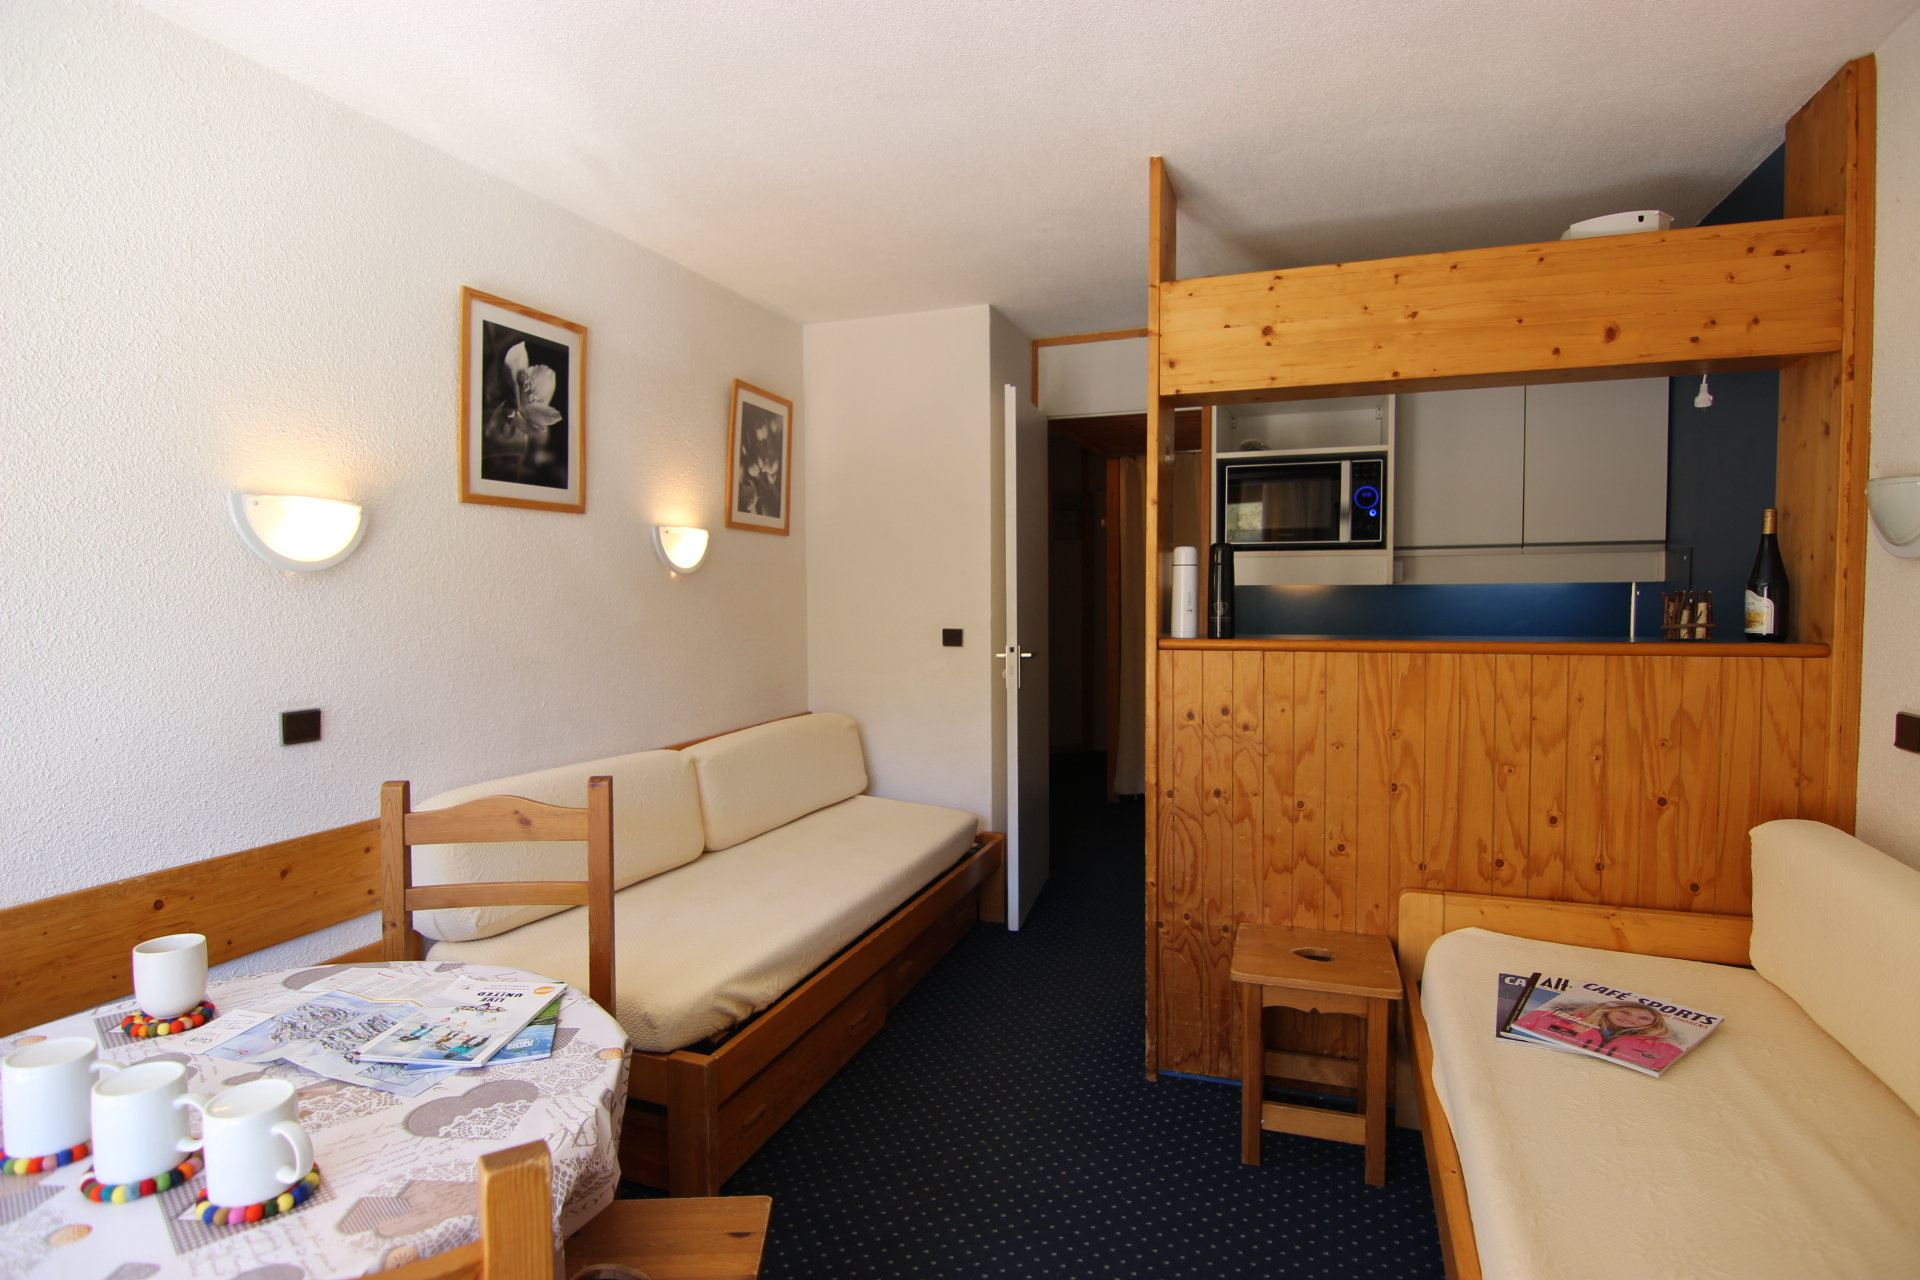 TEMPLES DU SOLEIL MACHU PICHU 703 / 2 ROOMS 4 PERSONS - 1 BRONZE SNOWFLAKE - VTI